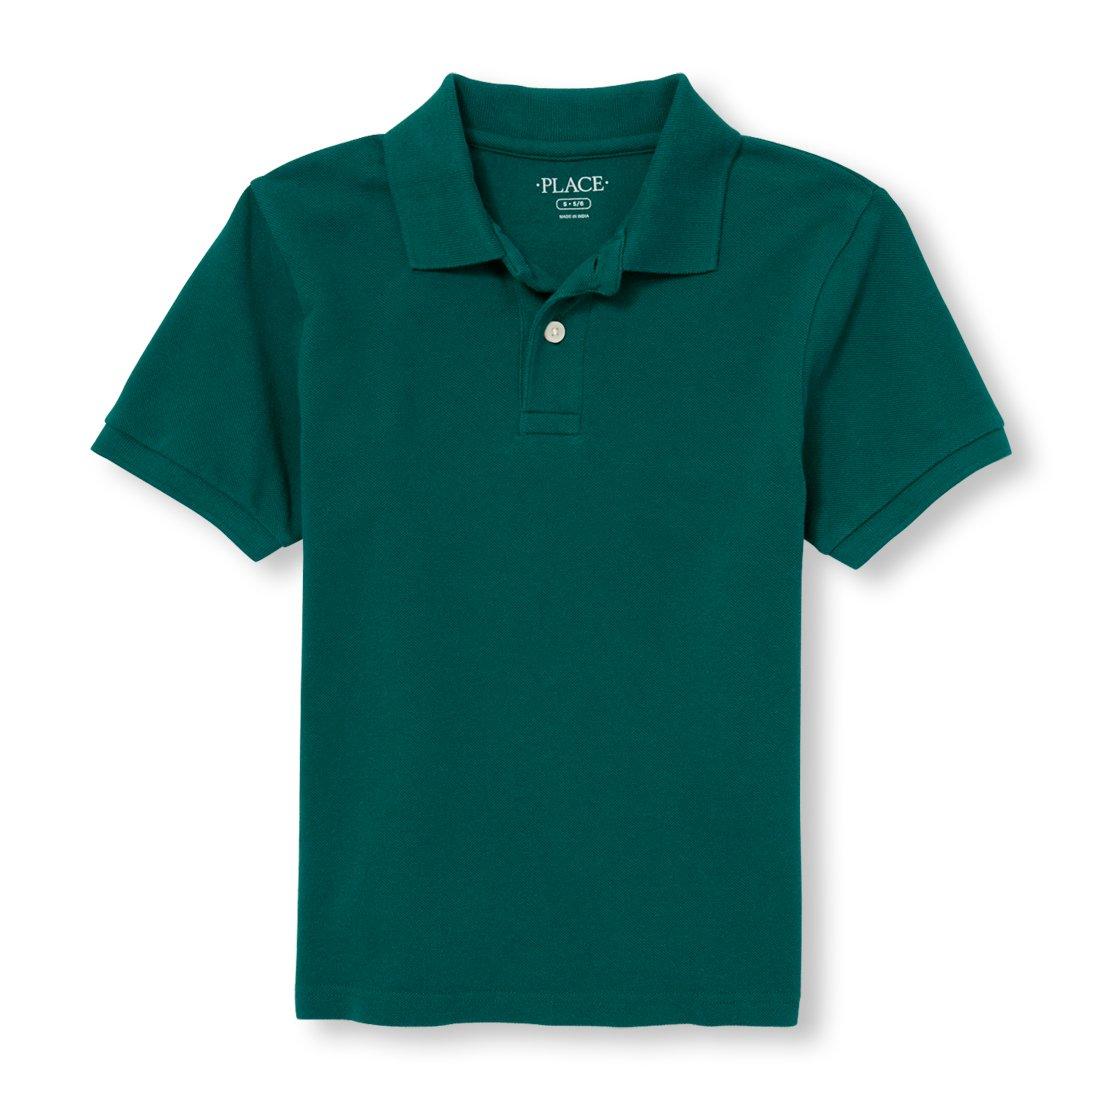 The Children's Place Big Boys' Uniform Short Sleeve Polo, African Rainforest 00602, S (5/6)